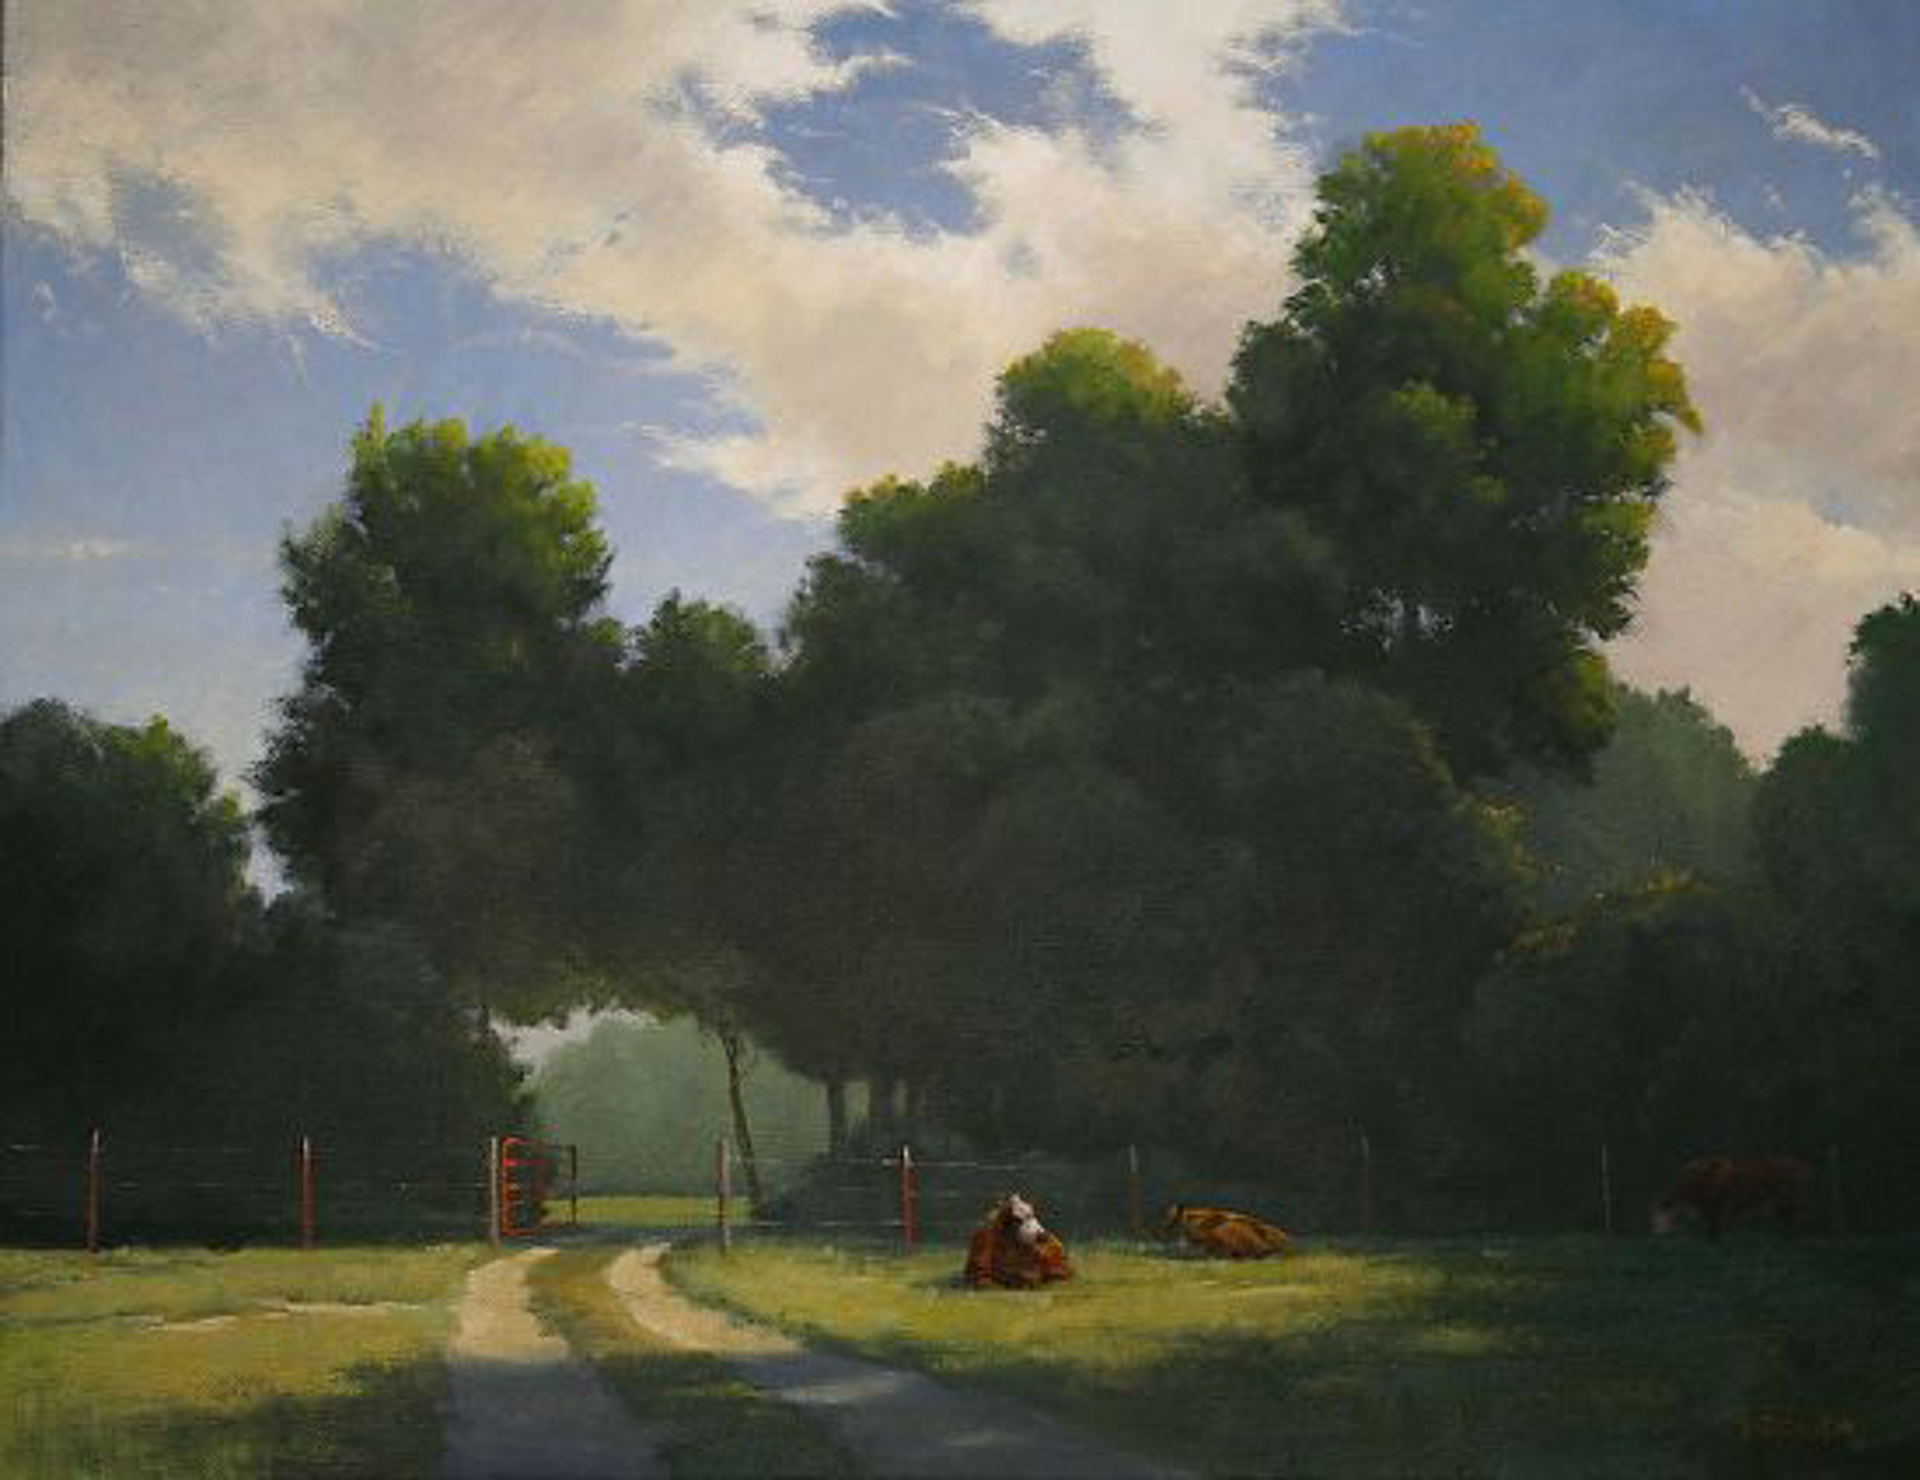 Red Gate by John Roush